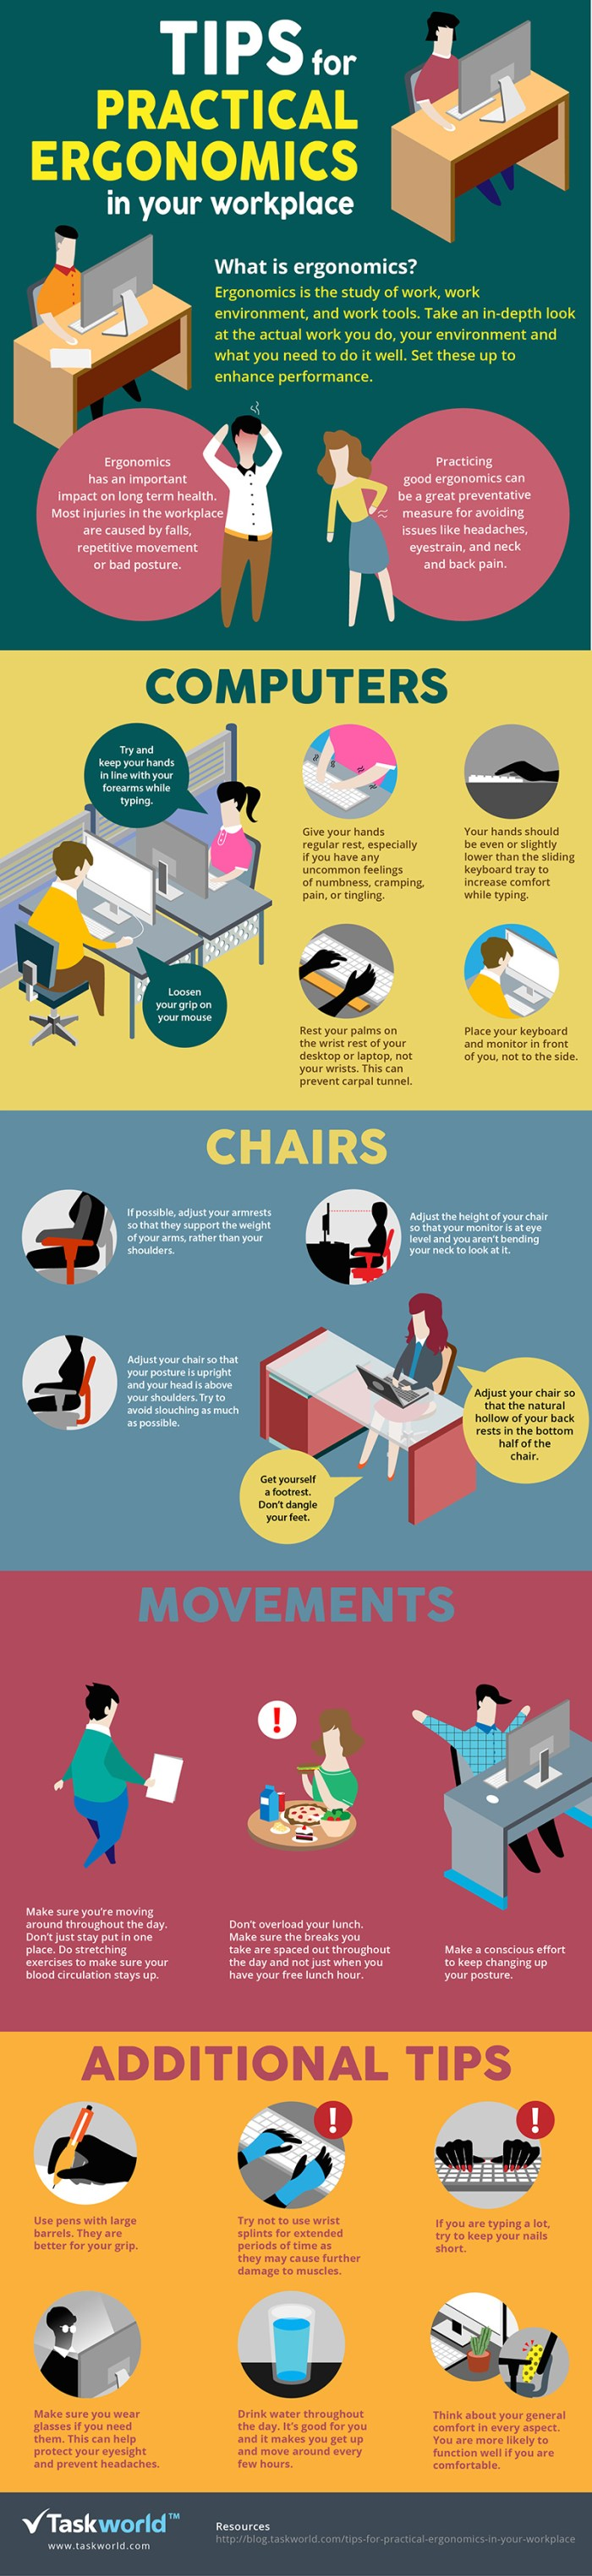 tips for practical ergonomics